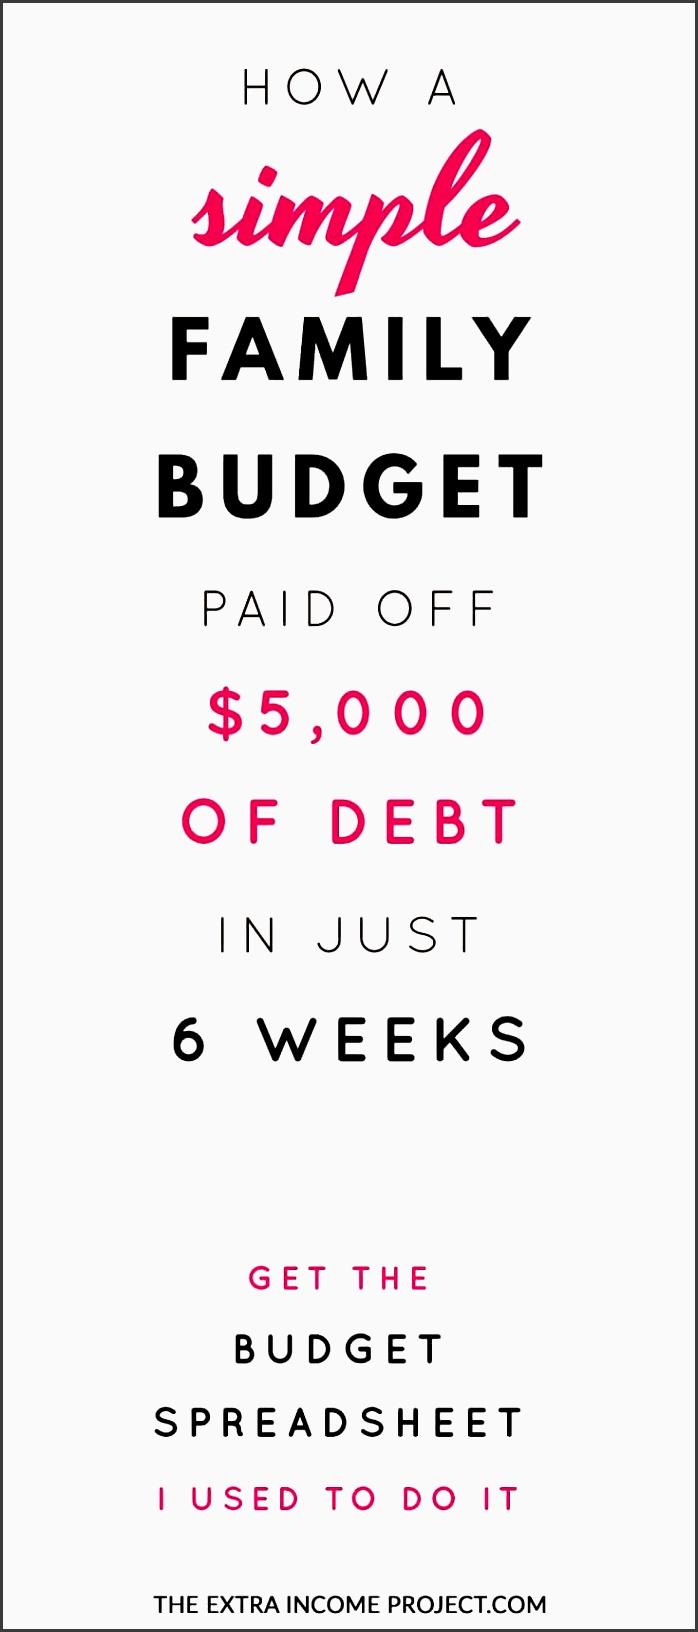 25 unique bud planner ideas on pinterest bud planning worksheet money management and bud ing tips